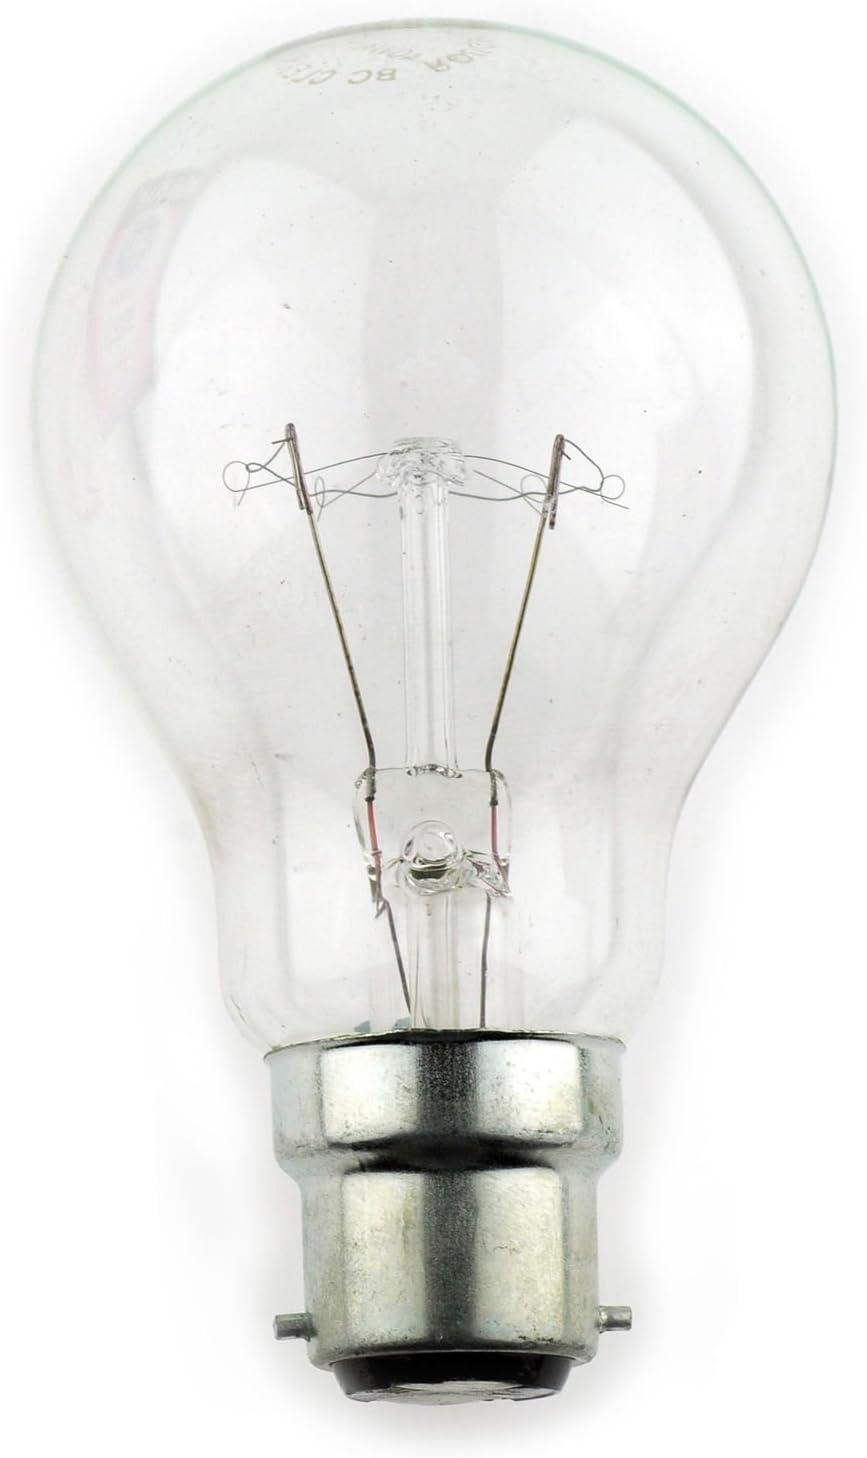 2x CROMPTON YELLOW  25W Coloured B22 BC Bayonet Lamp Light Bulb 240V Old Style